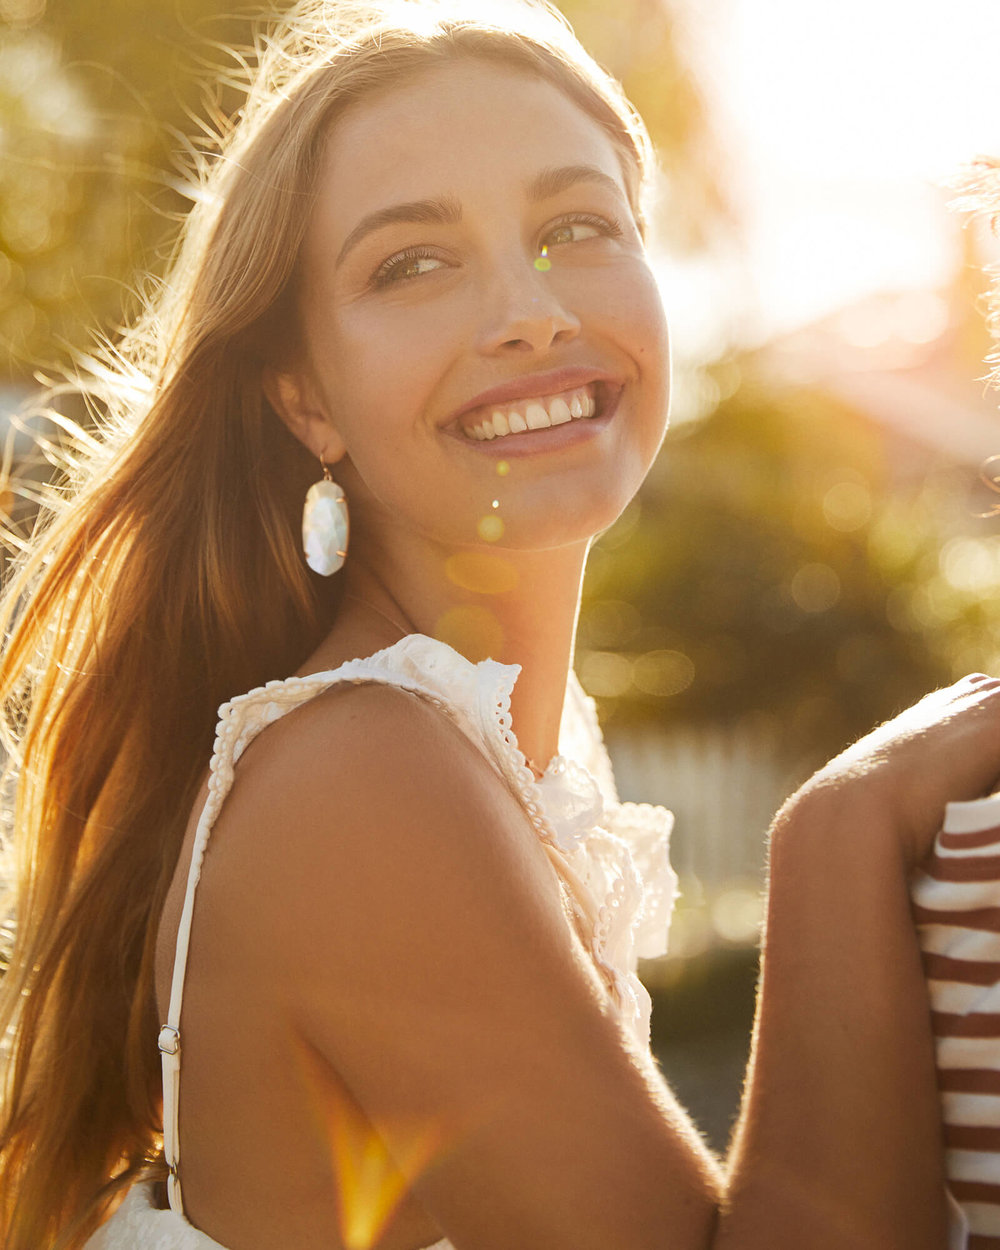 kendra-scott-esme-earring-rosegold-ivory-mop-01-lg.jpg